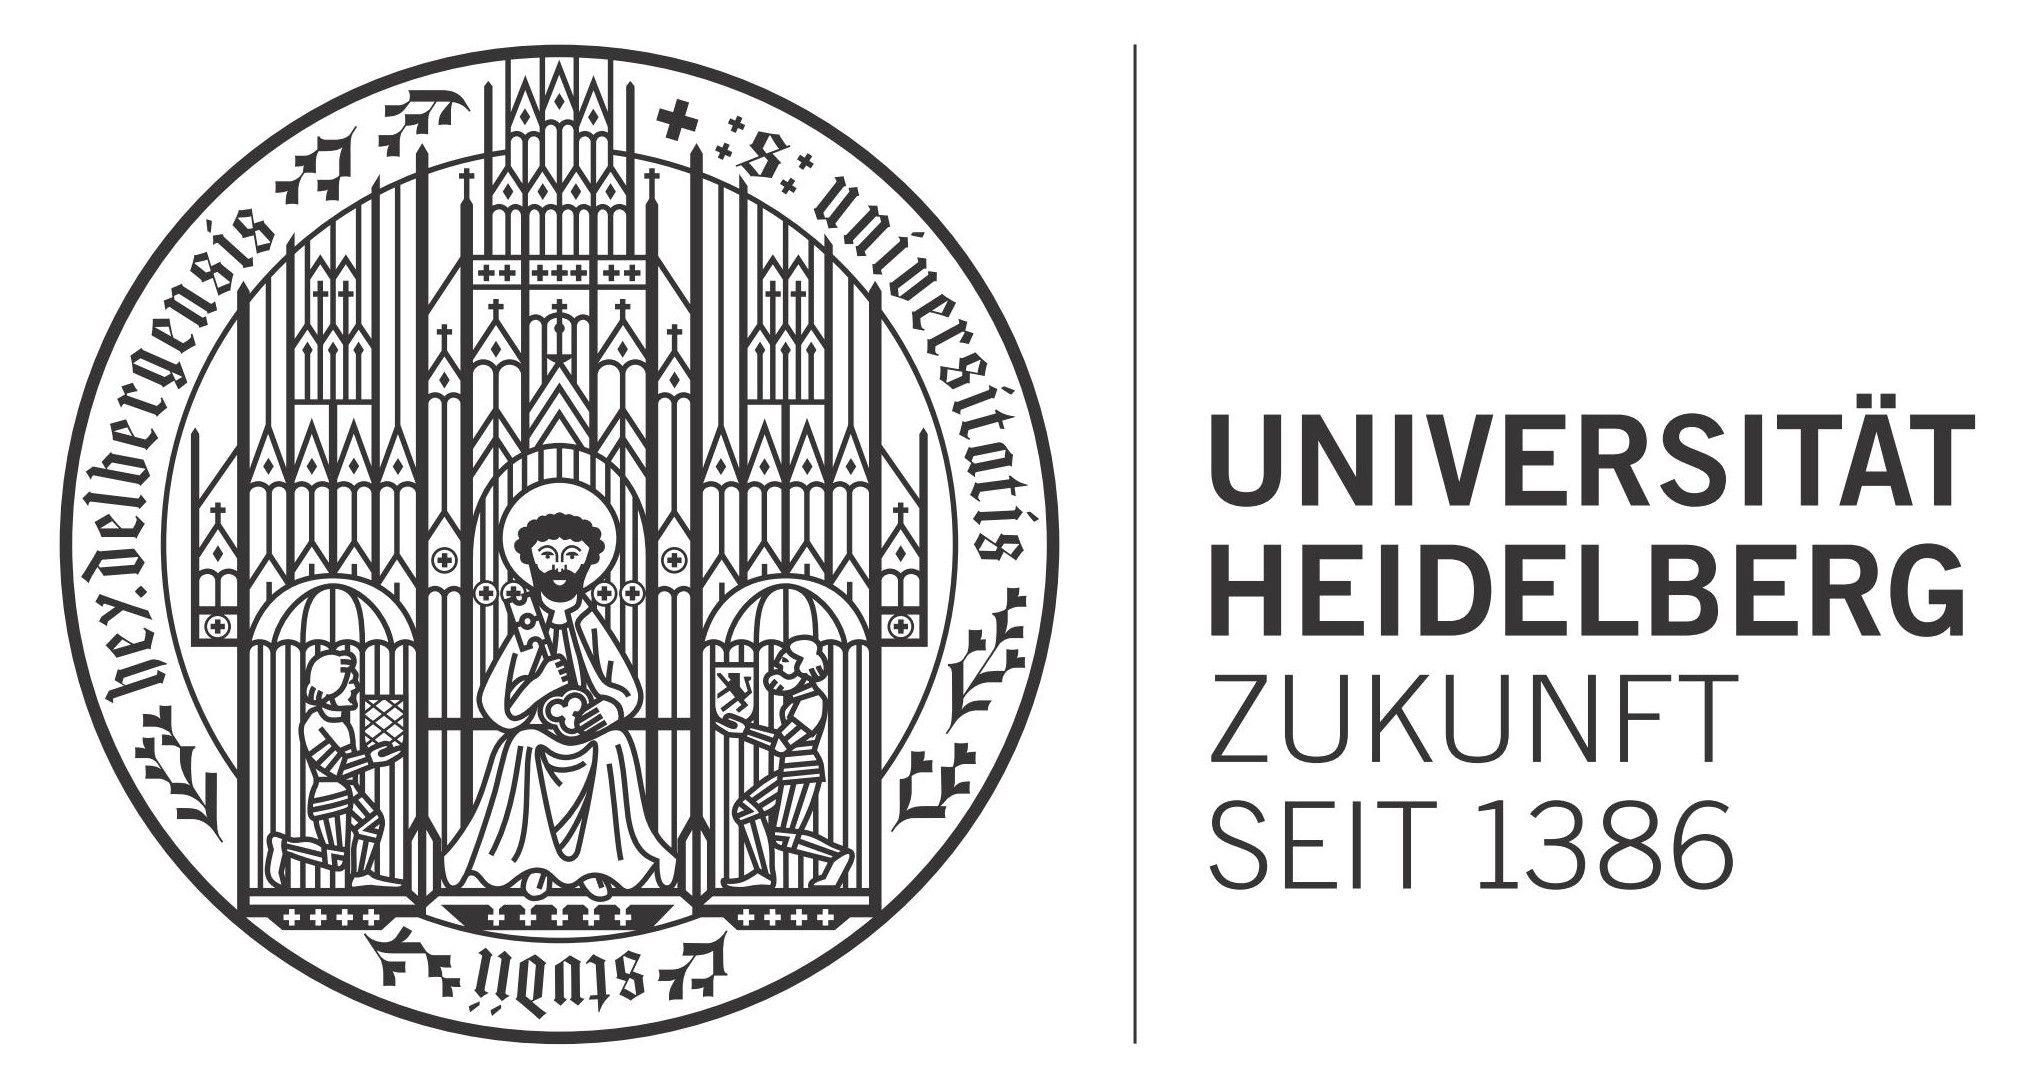 heidelberg university logo eps file almanya baden w rttemberg bernhard eitel coimbra. Black Bedroom Furniture Sets. Home Design Ideas